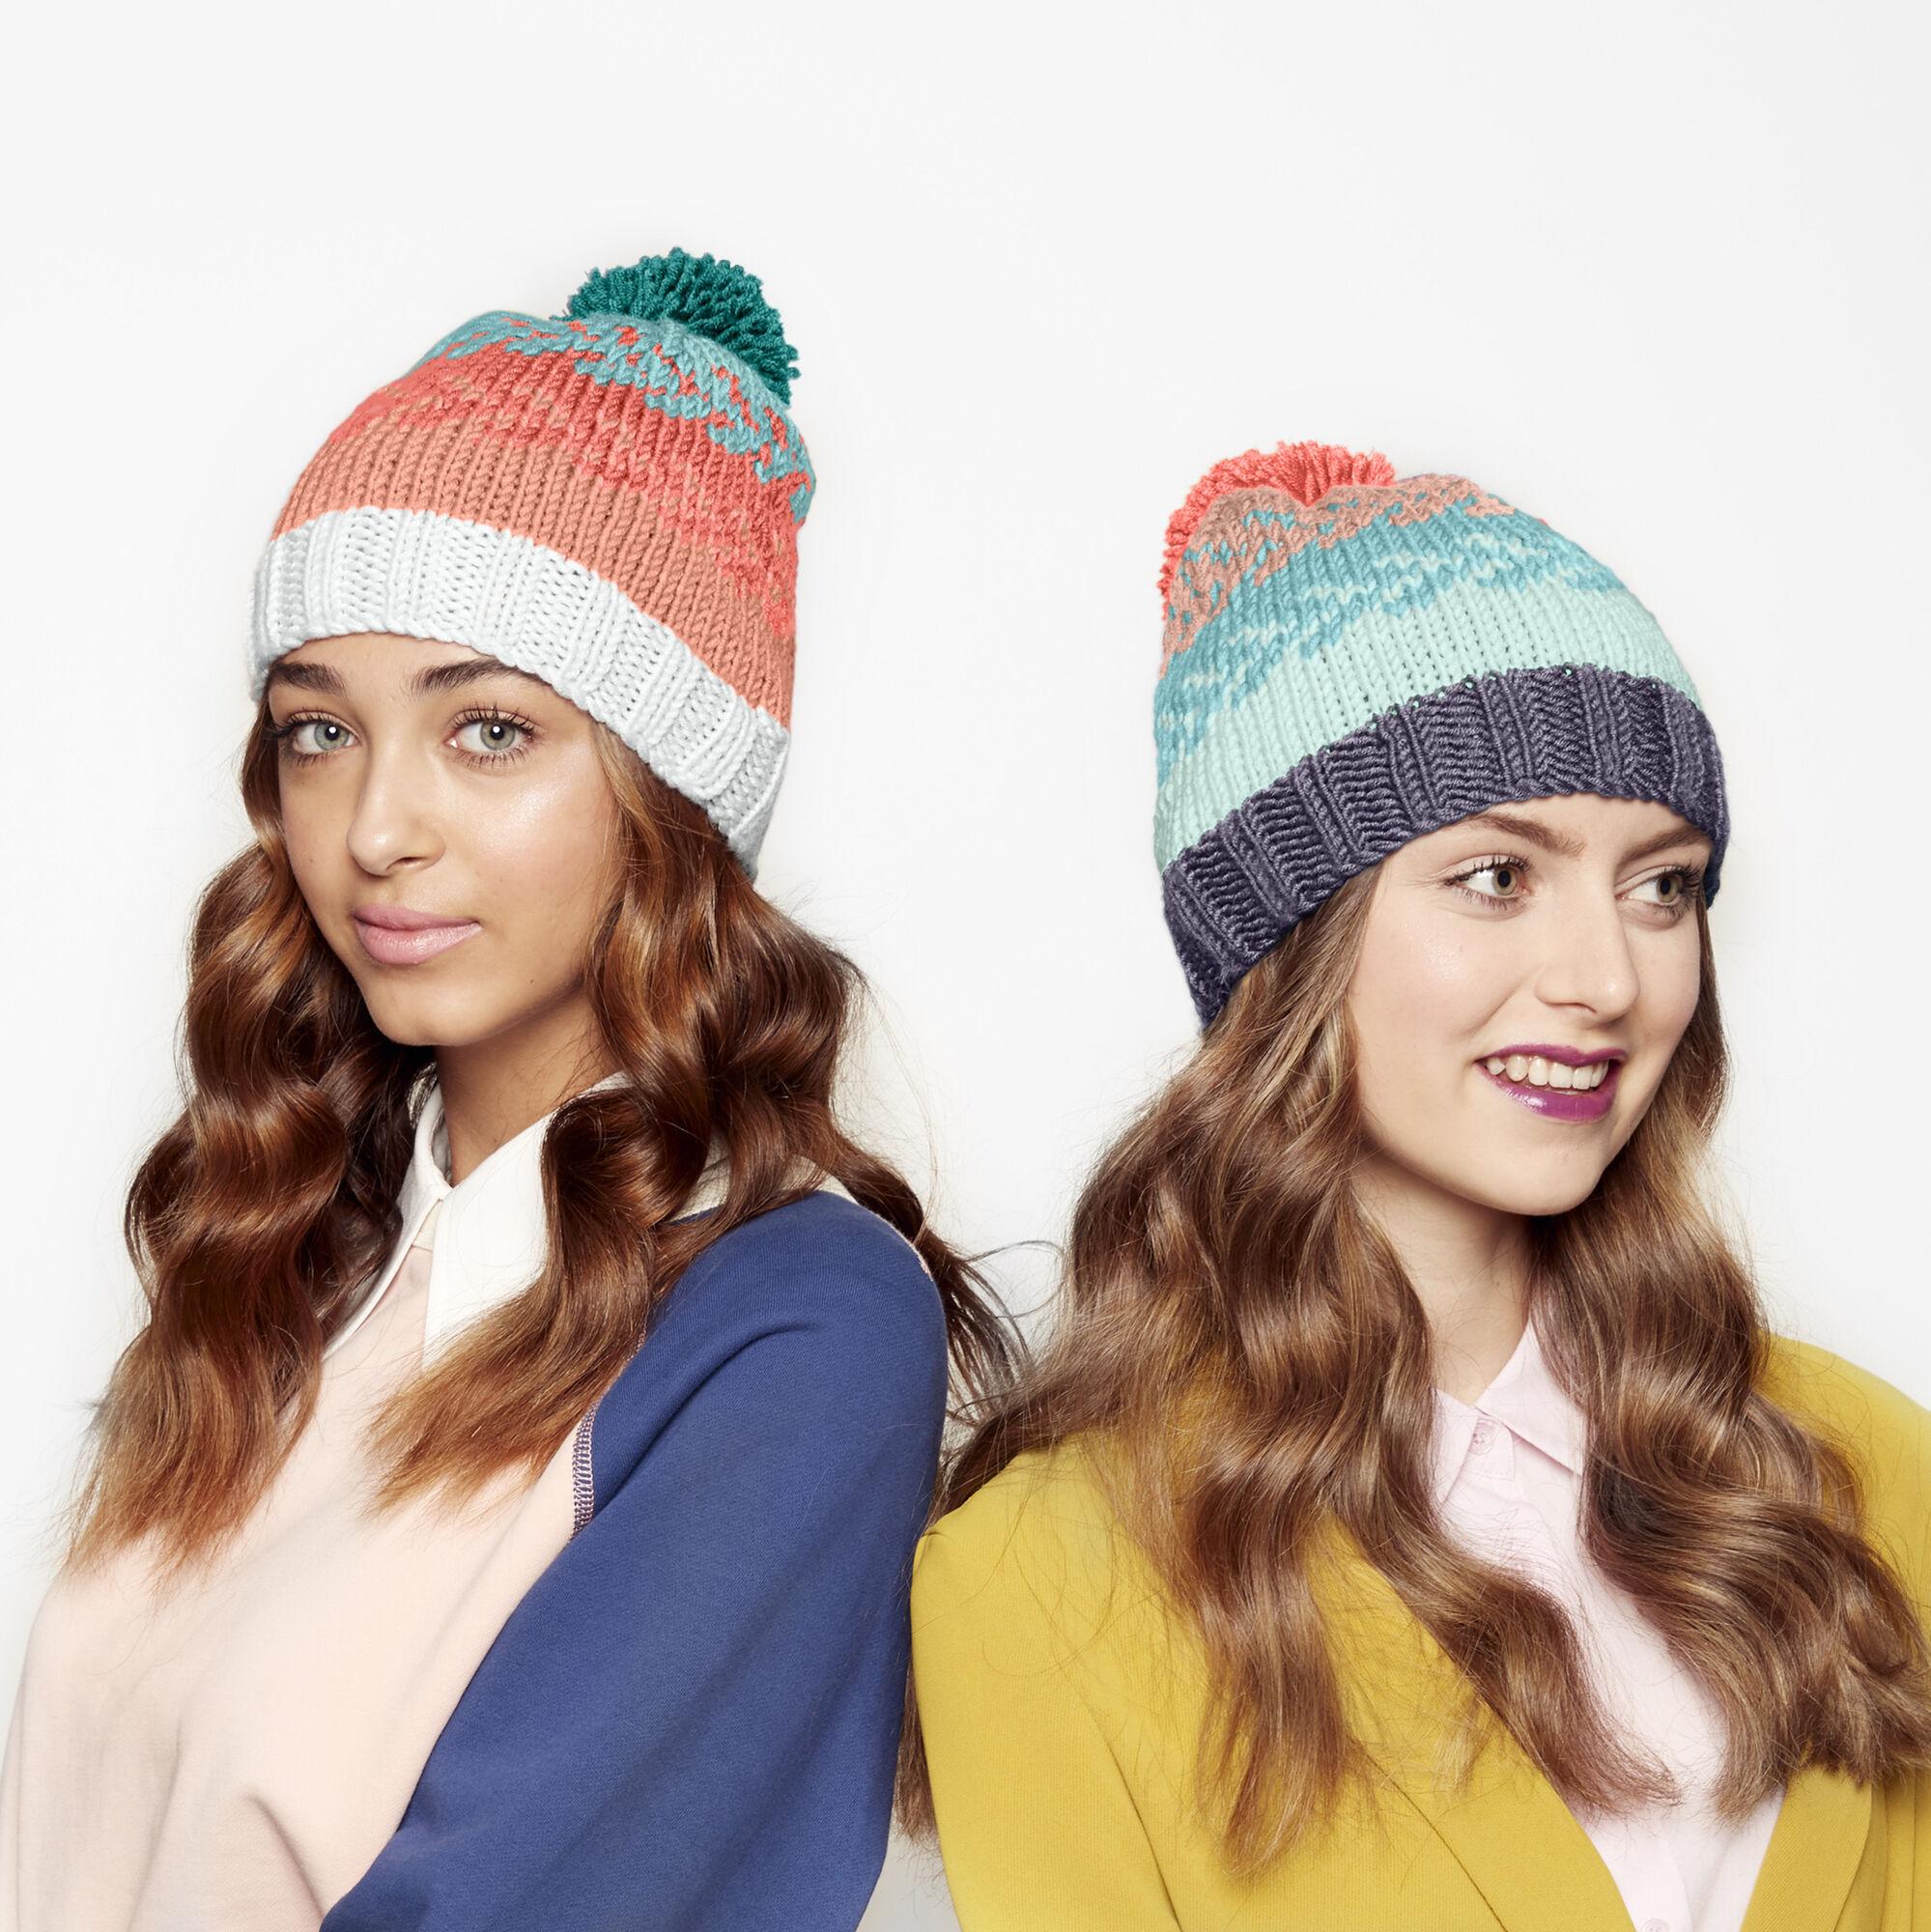 7a6528f11 Caron x Pantone Knit Fair Isle Hat Free Pattern | Yarnspirations